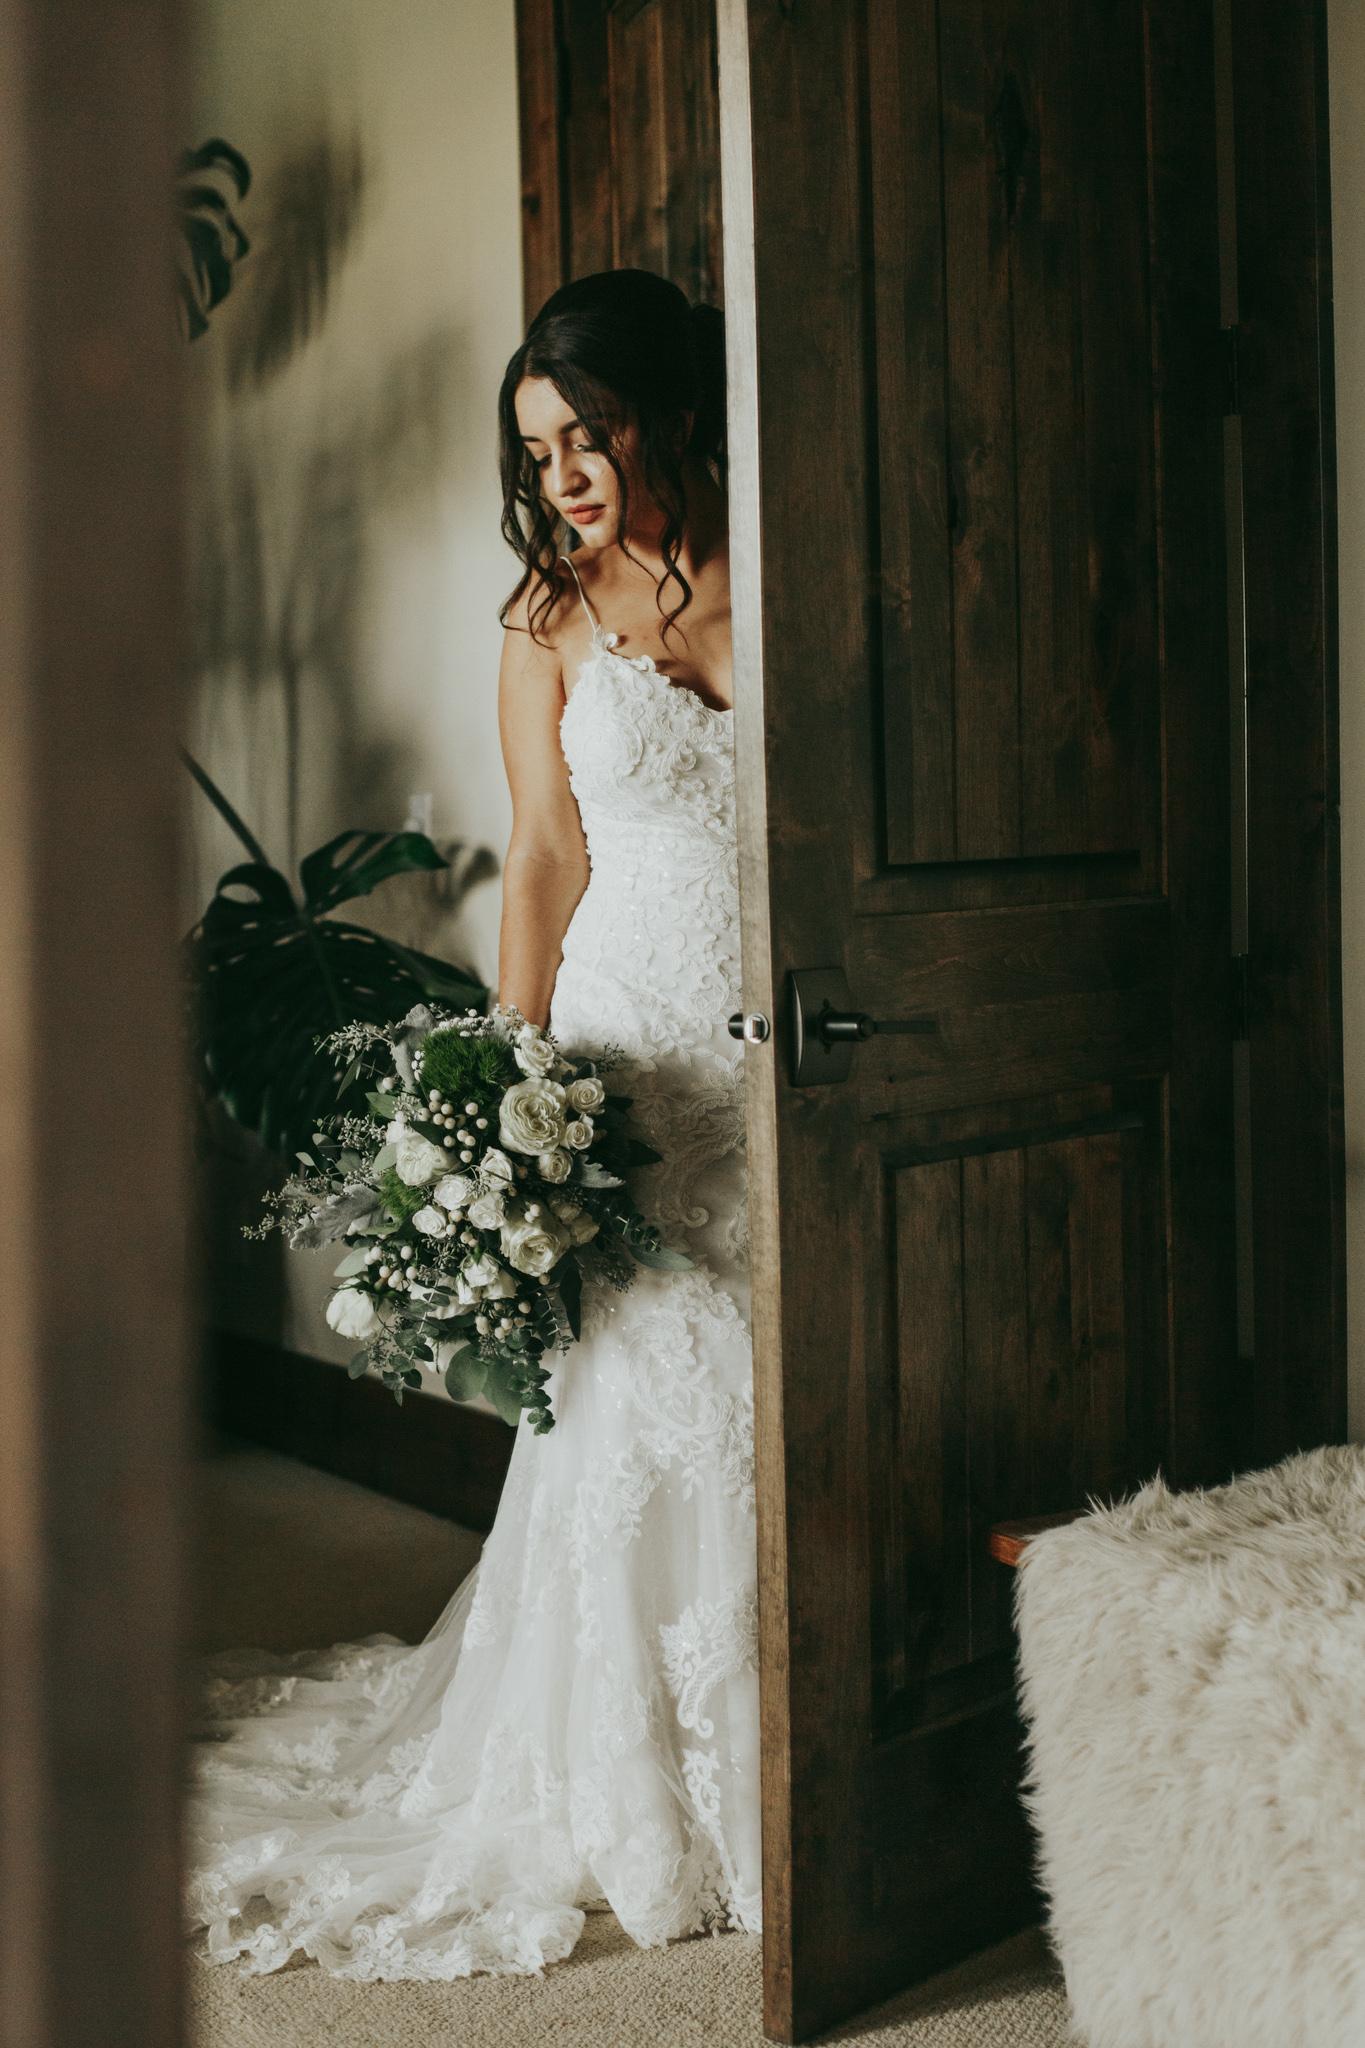 Olga_janni_wedding_090917_WEBSIZE (121 of 704).jpg